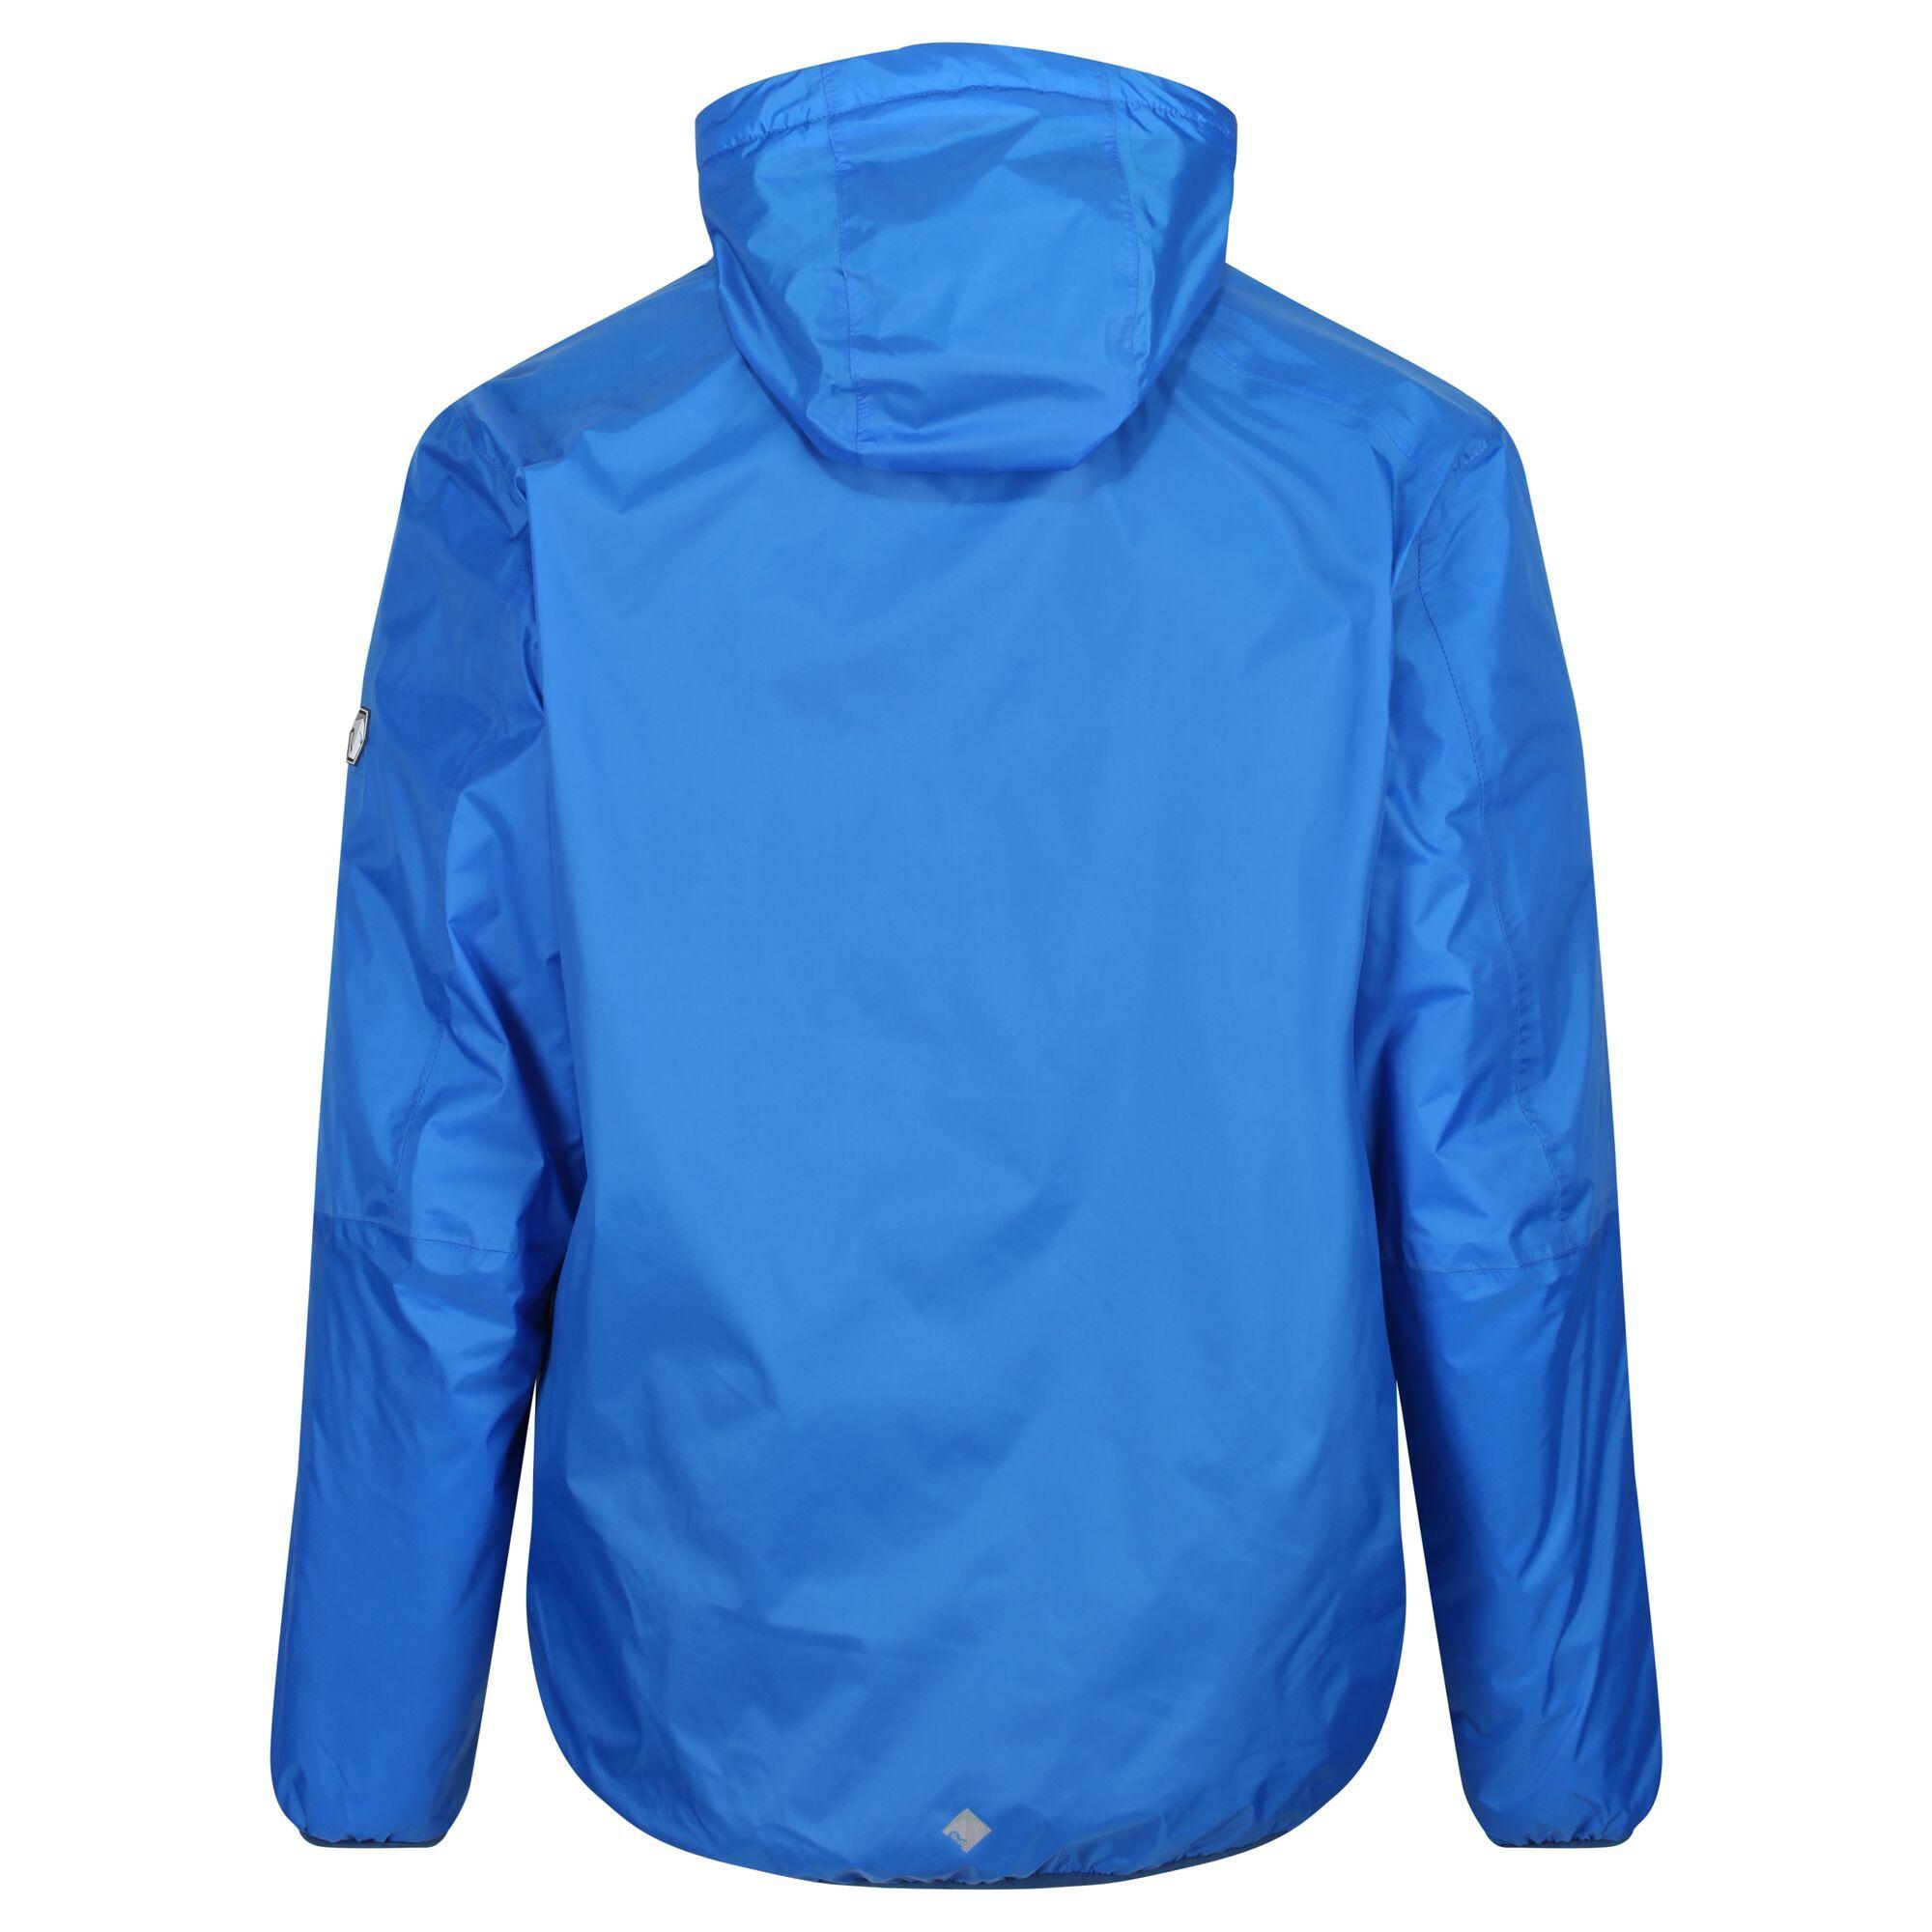 Regatta-Tarren-Mens-Wateproof-Breathable-Fleece-Lined-Jacket-RRP-70 thumbnail 9